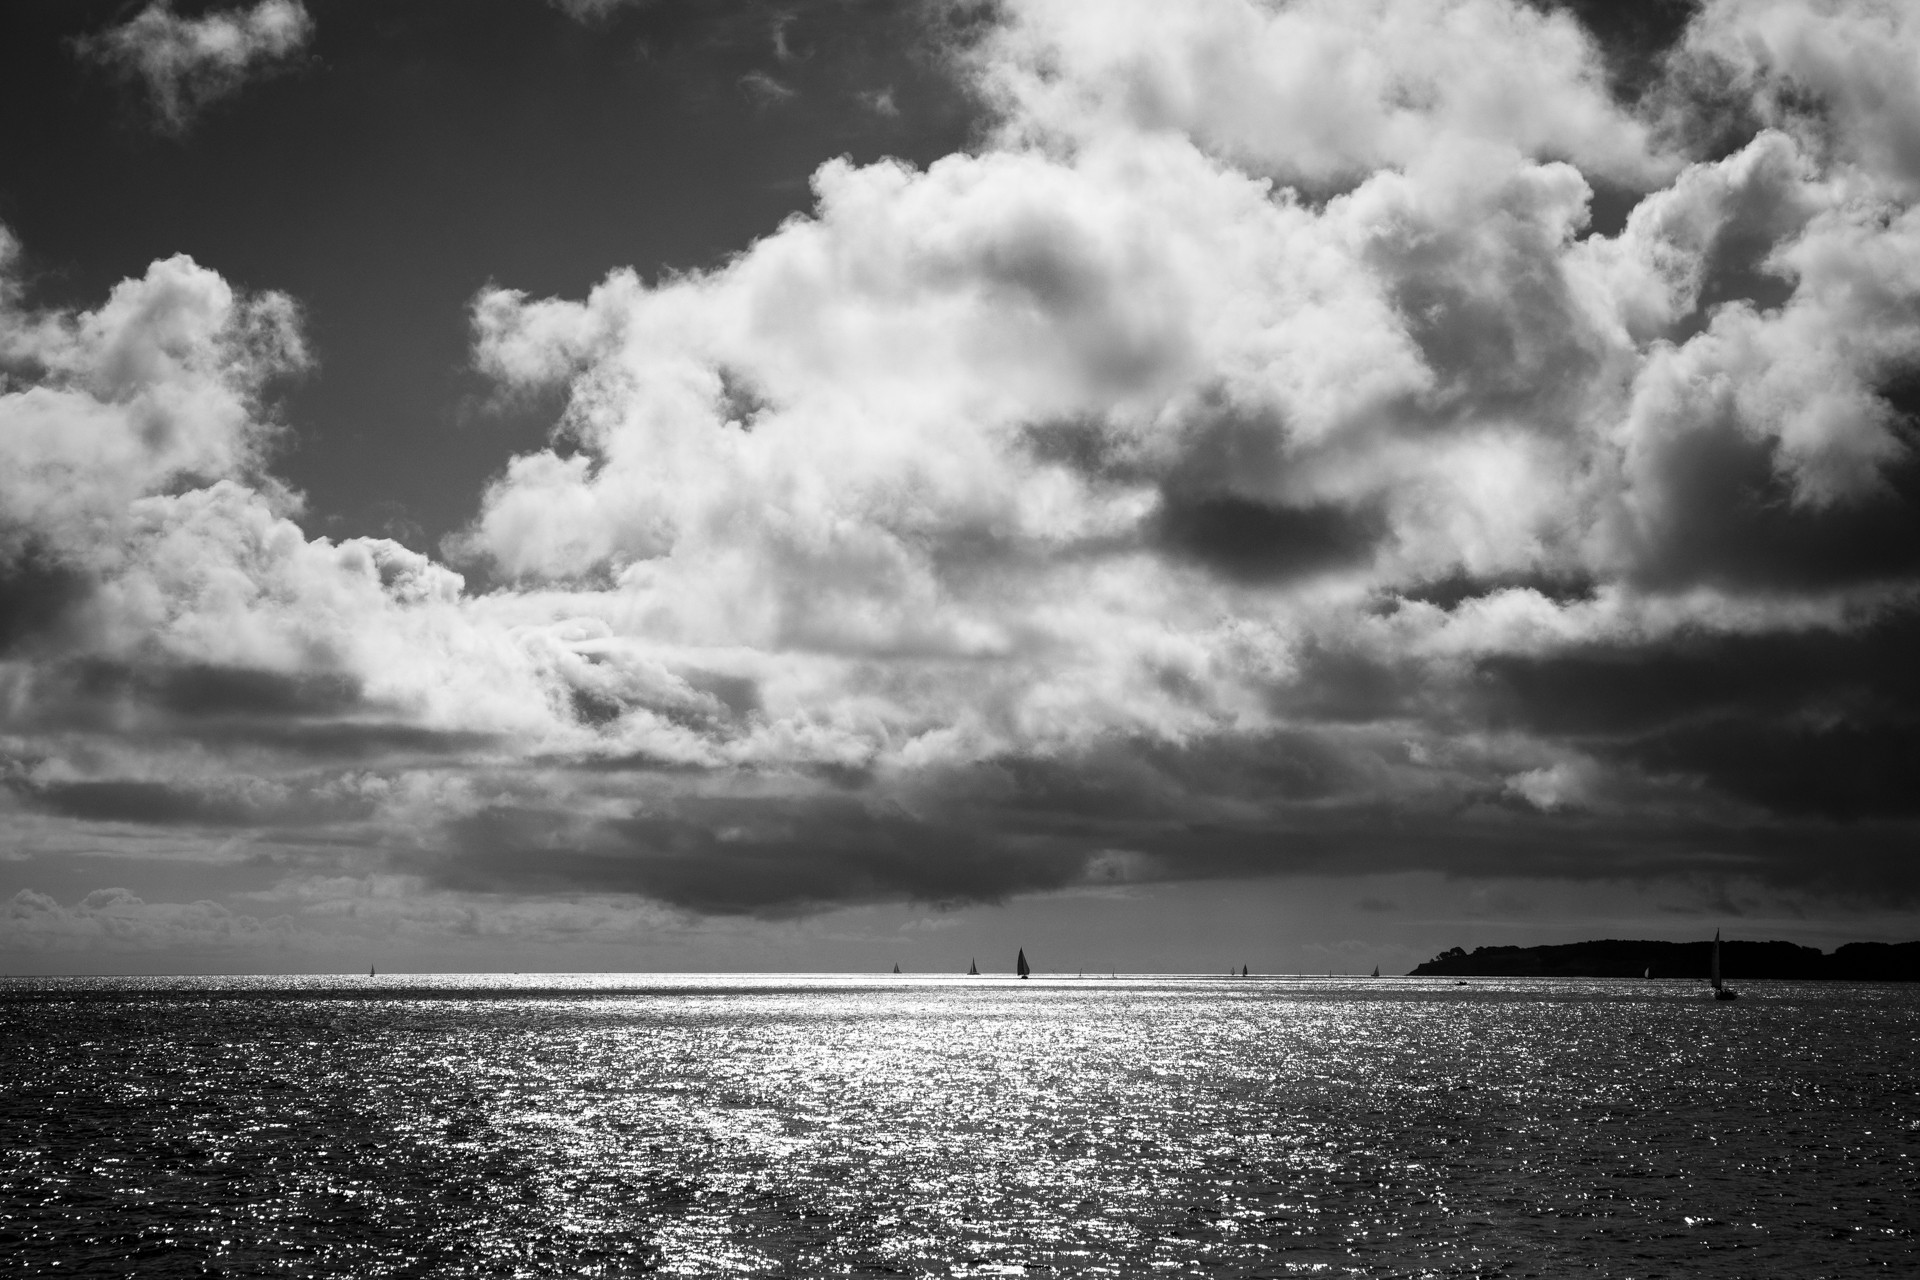 En allant à Belle-Ile - Morbihan - Août 2020